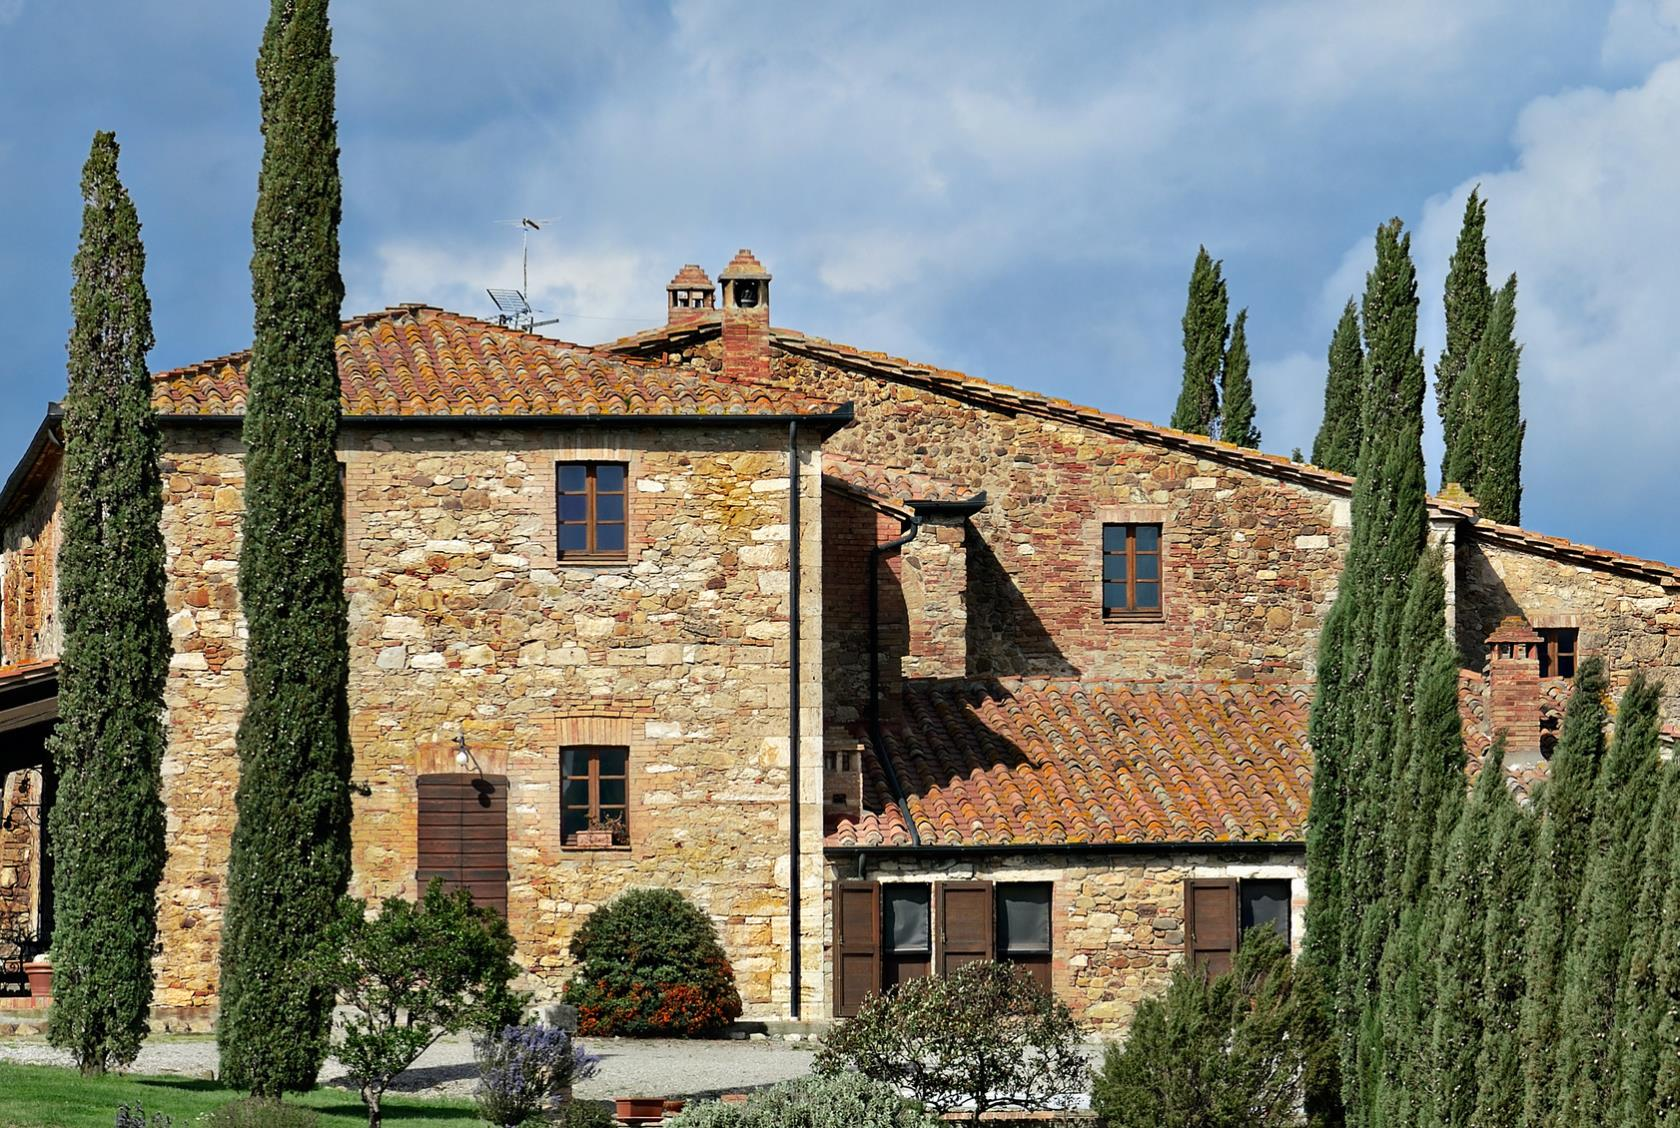 Holiday apartments in Tuscany San Gimignano Firenze